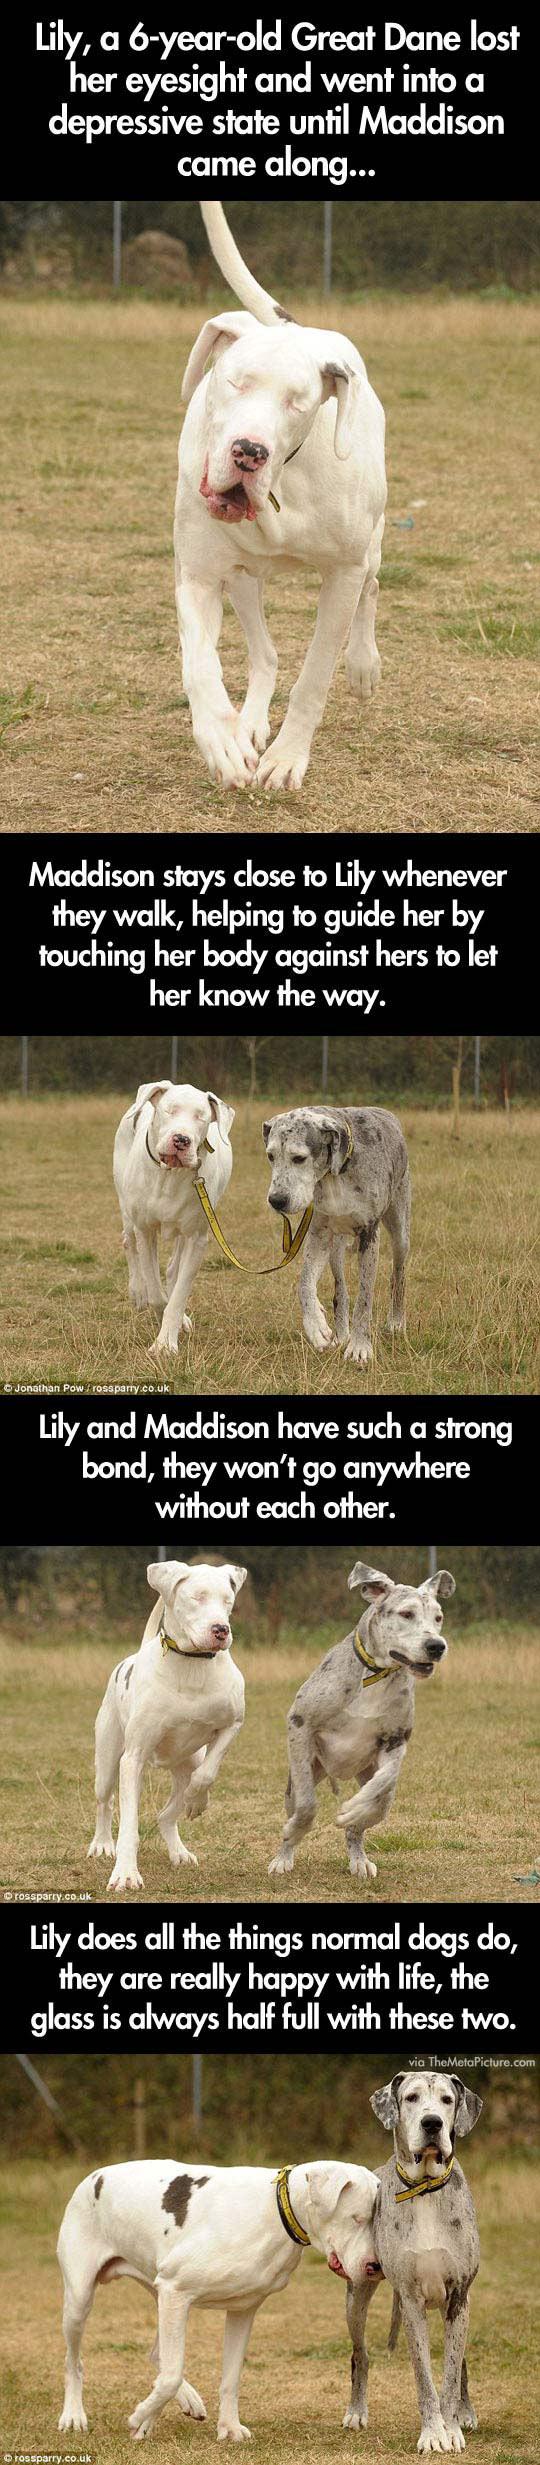 cute-blind-dog-guide-Great-Dane